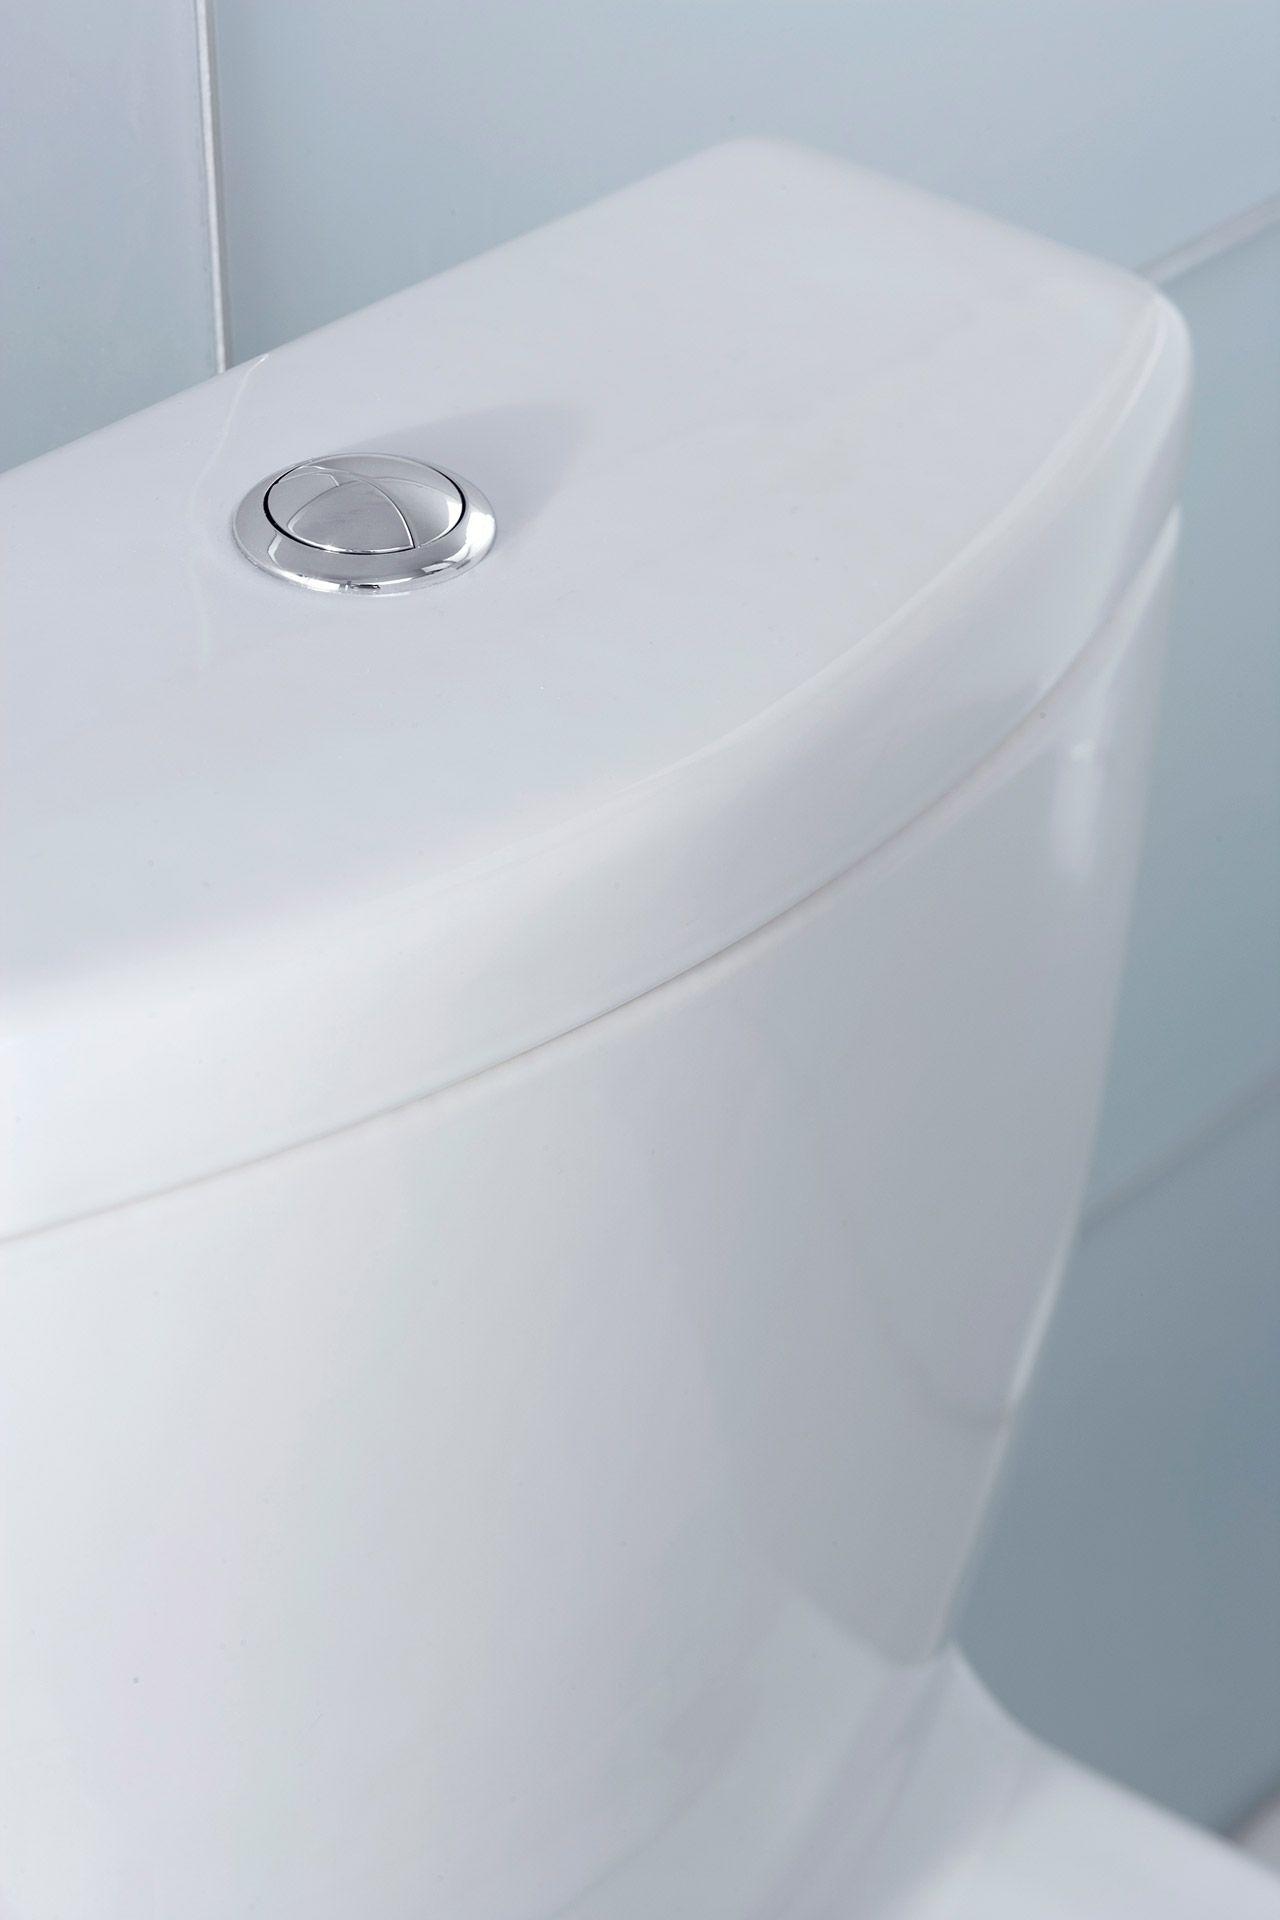 Toto Toilet Installation Manual